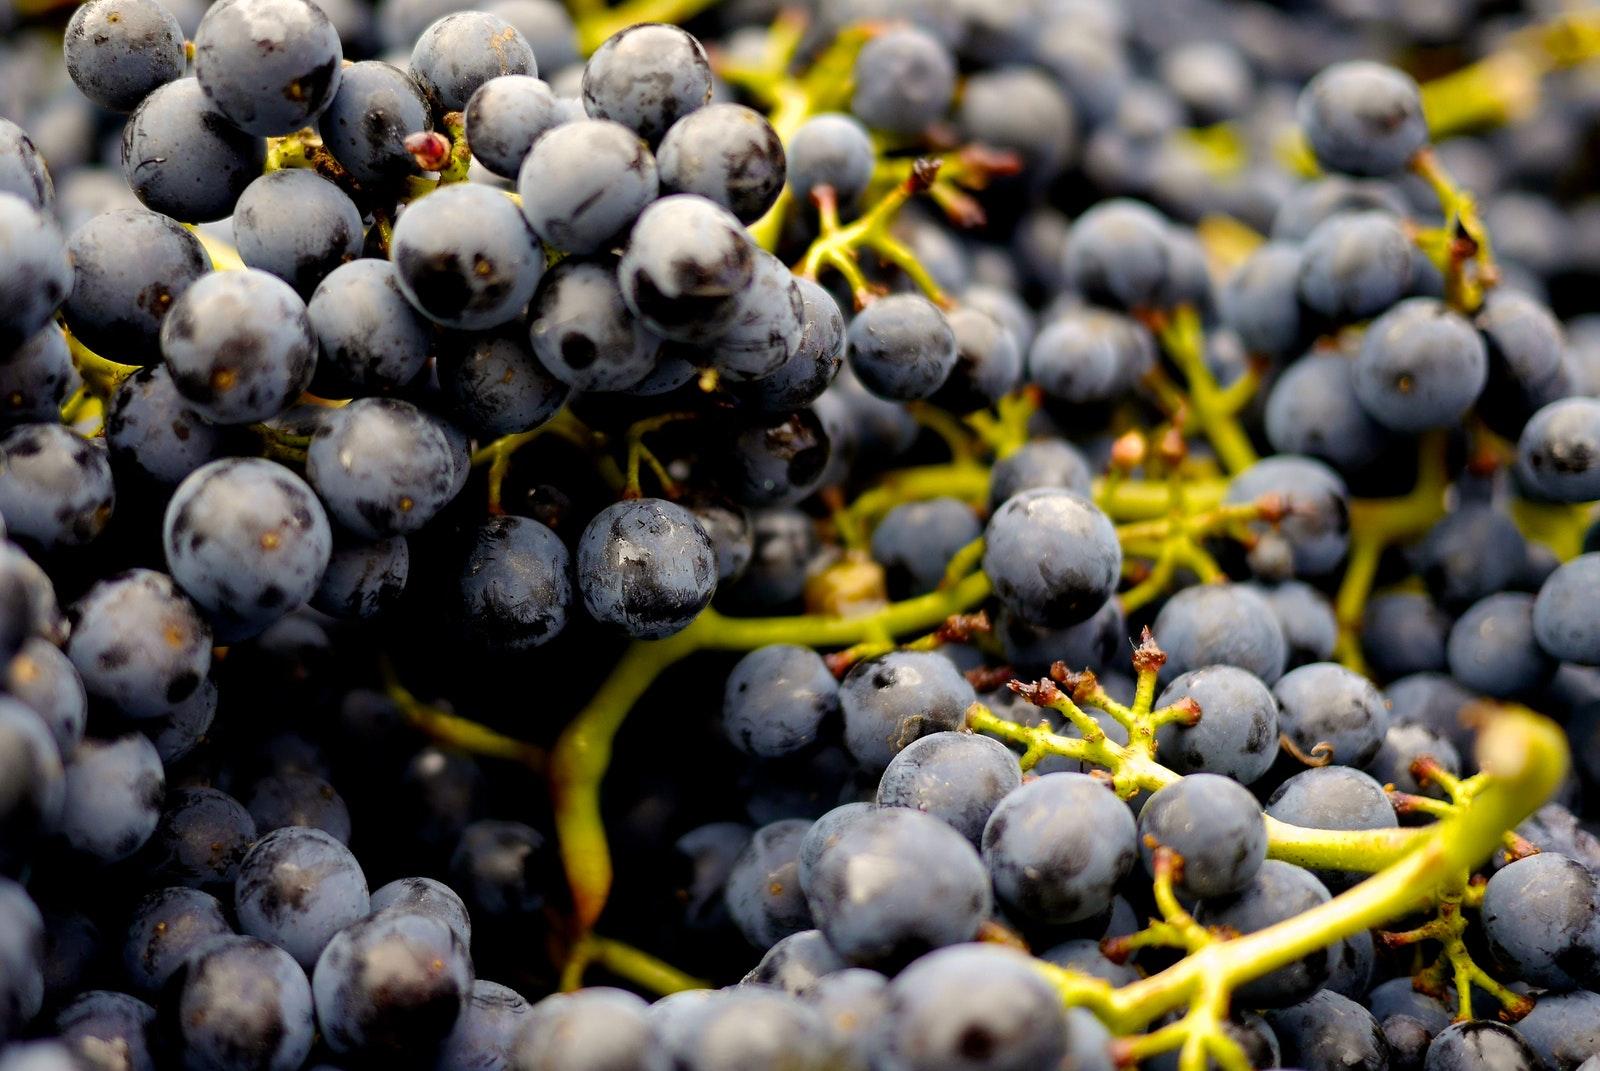 abundance-alcohol-berries-357742